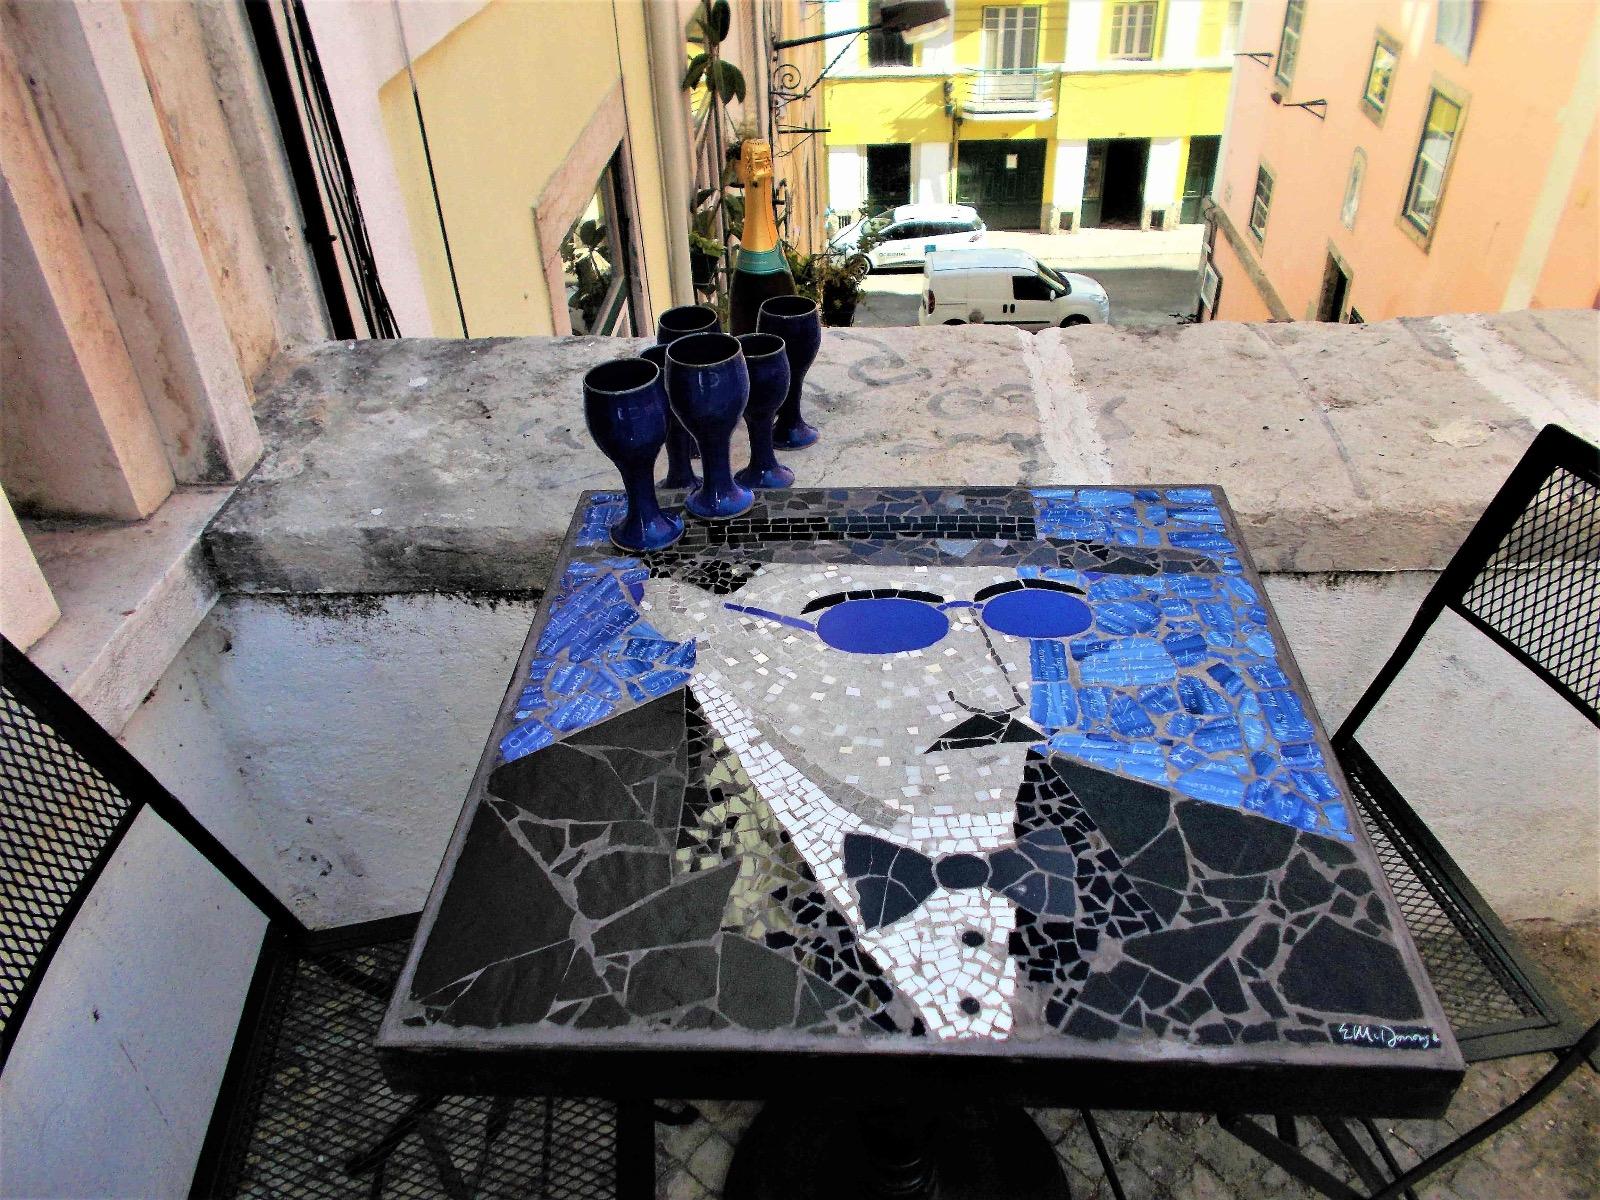 Check Eileen McDonough's tile mosaic artwork and mosaic designs on mosaicslab.com